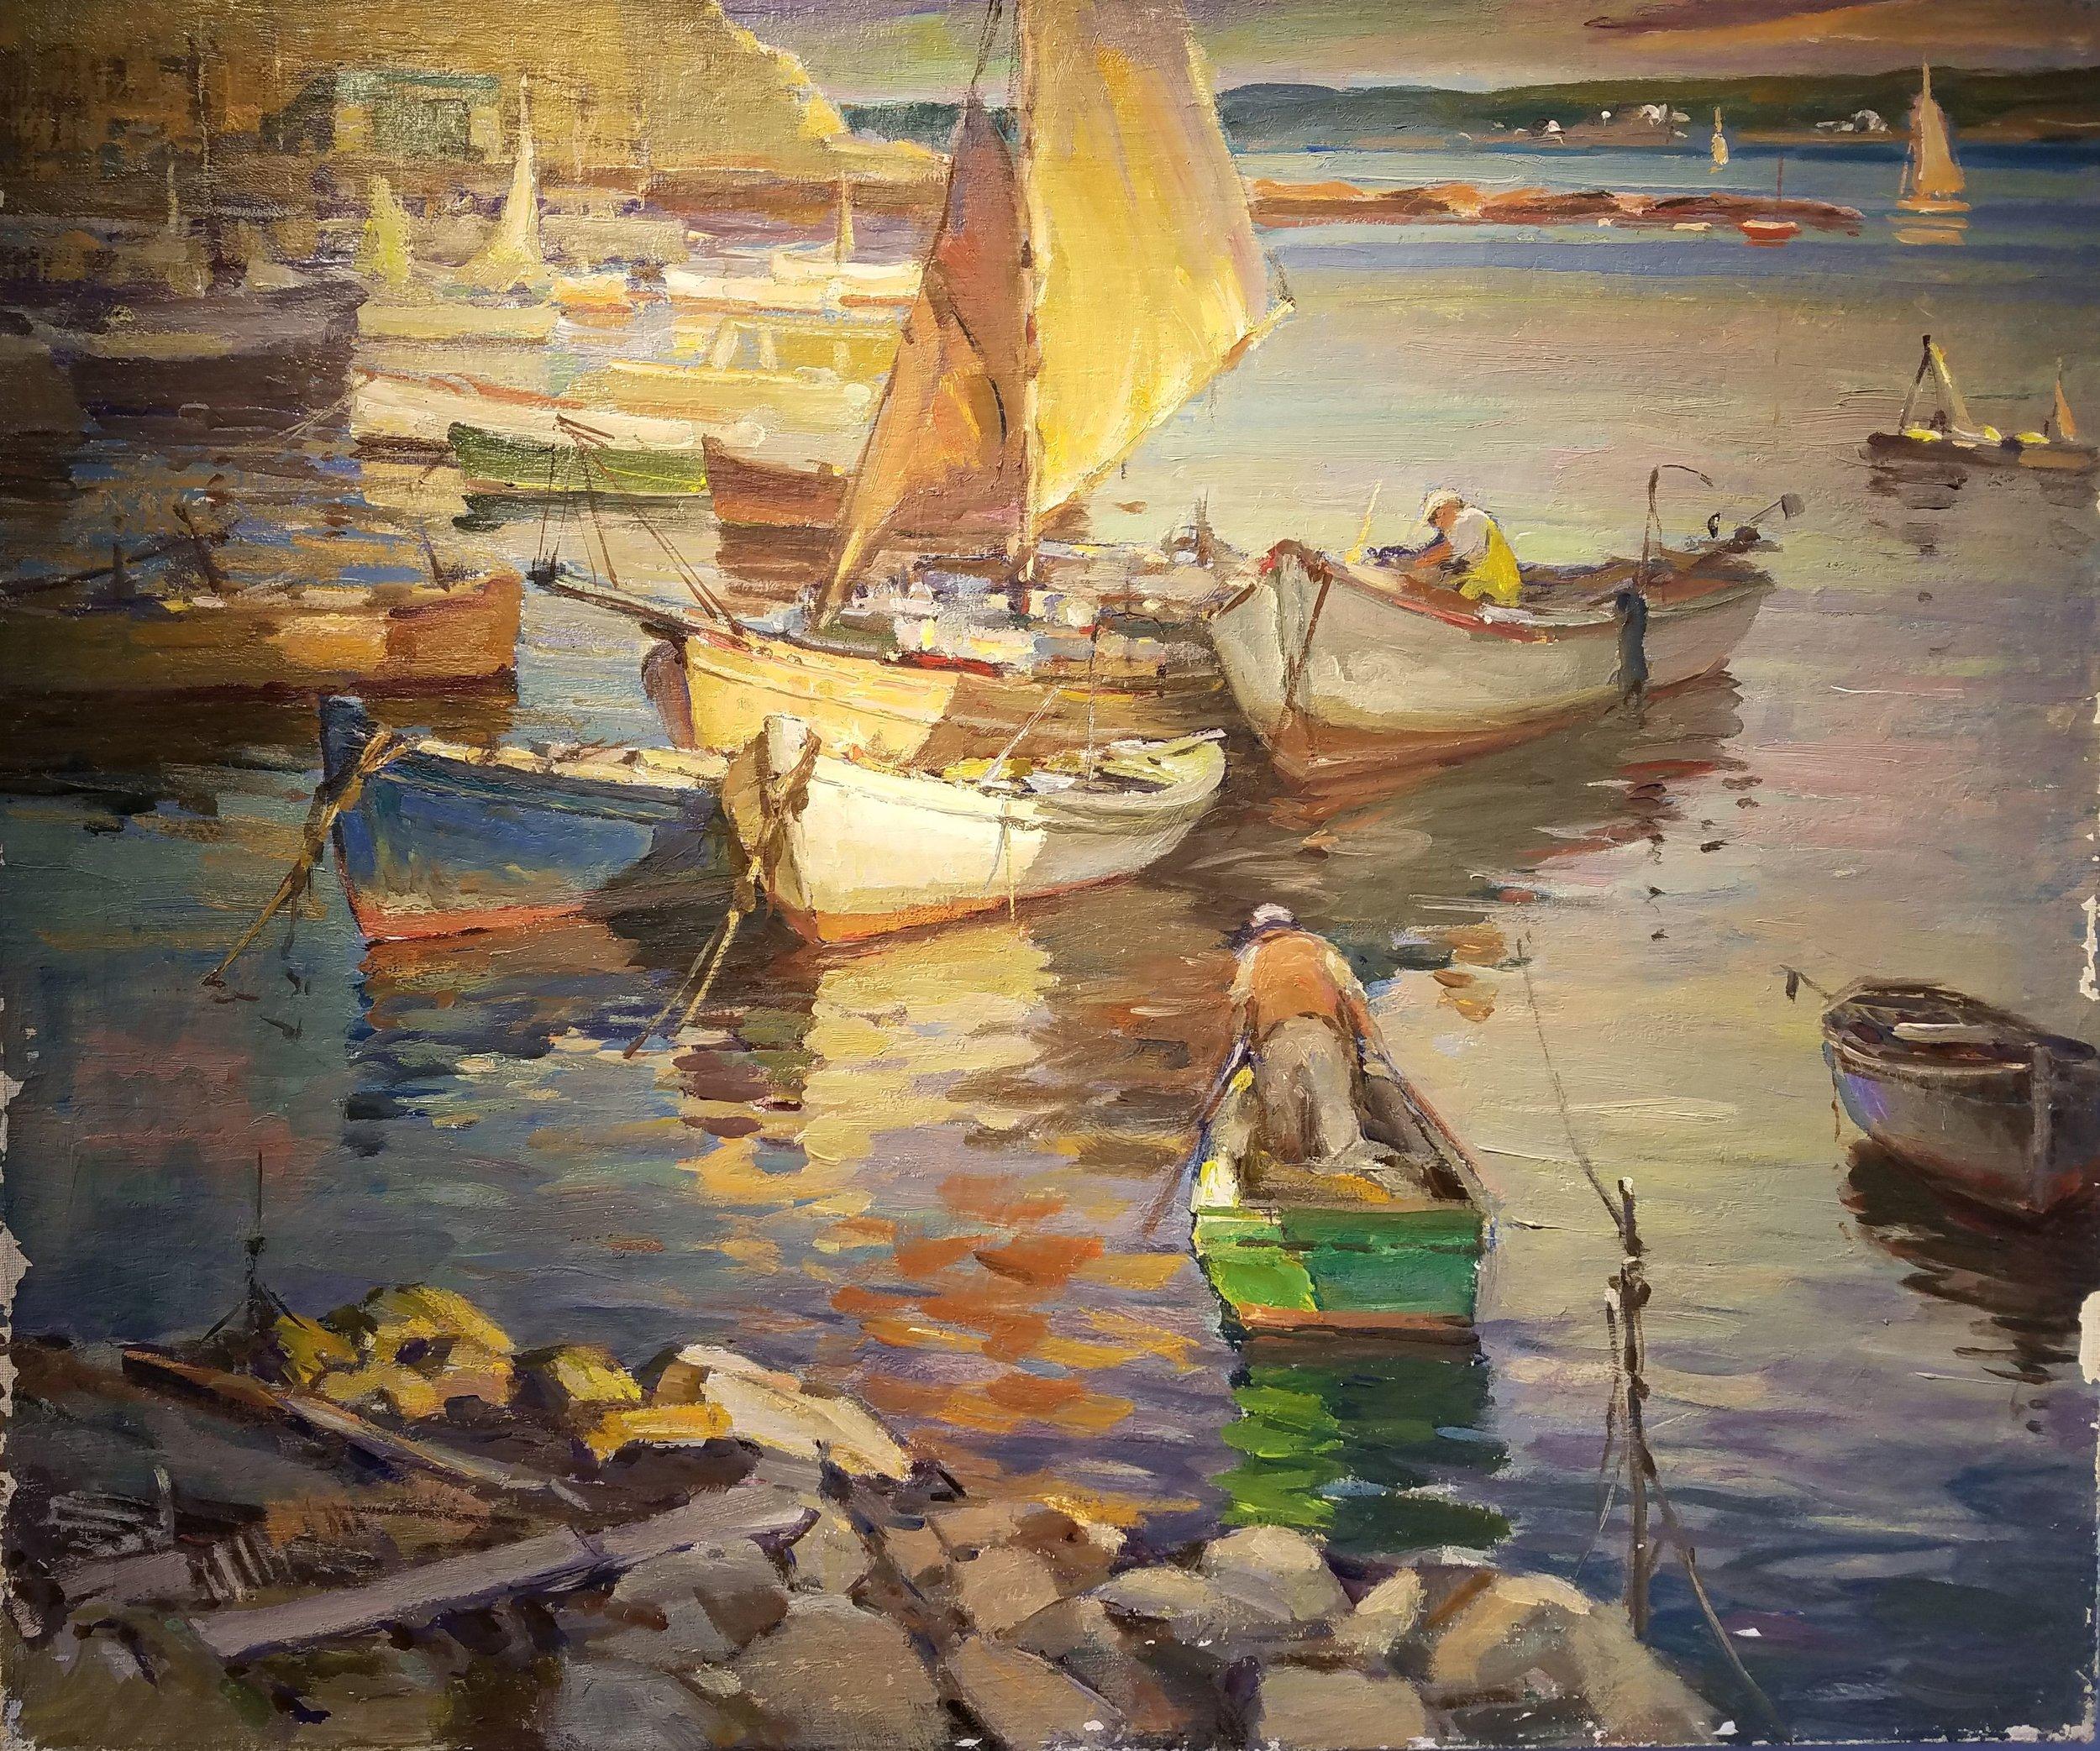 84.1.90_A. Cirino_Harbor Scene_25x30.jpg